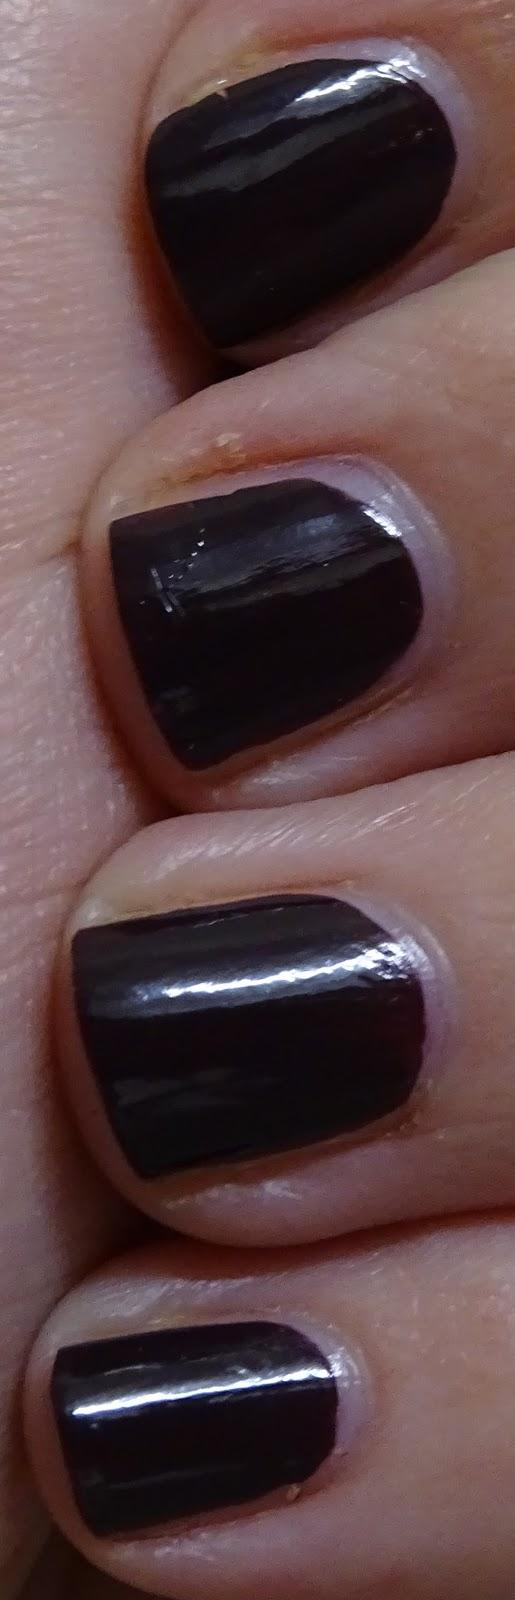 Das Mini bloggt: [Nagellack] Catrice 38 Vino Tinto